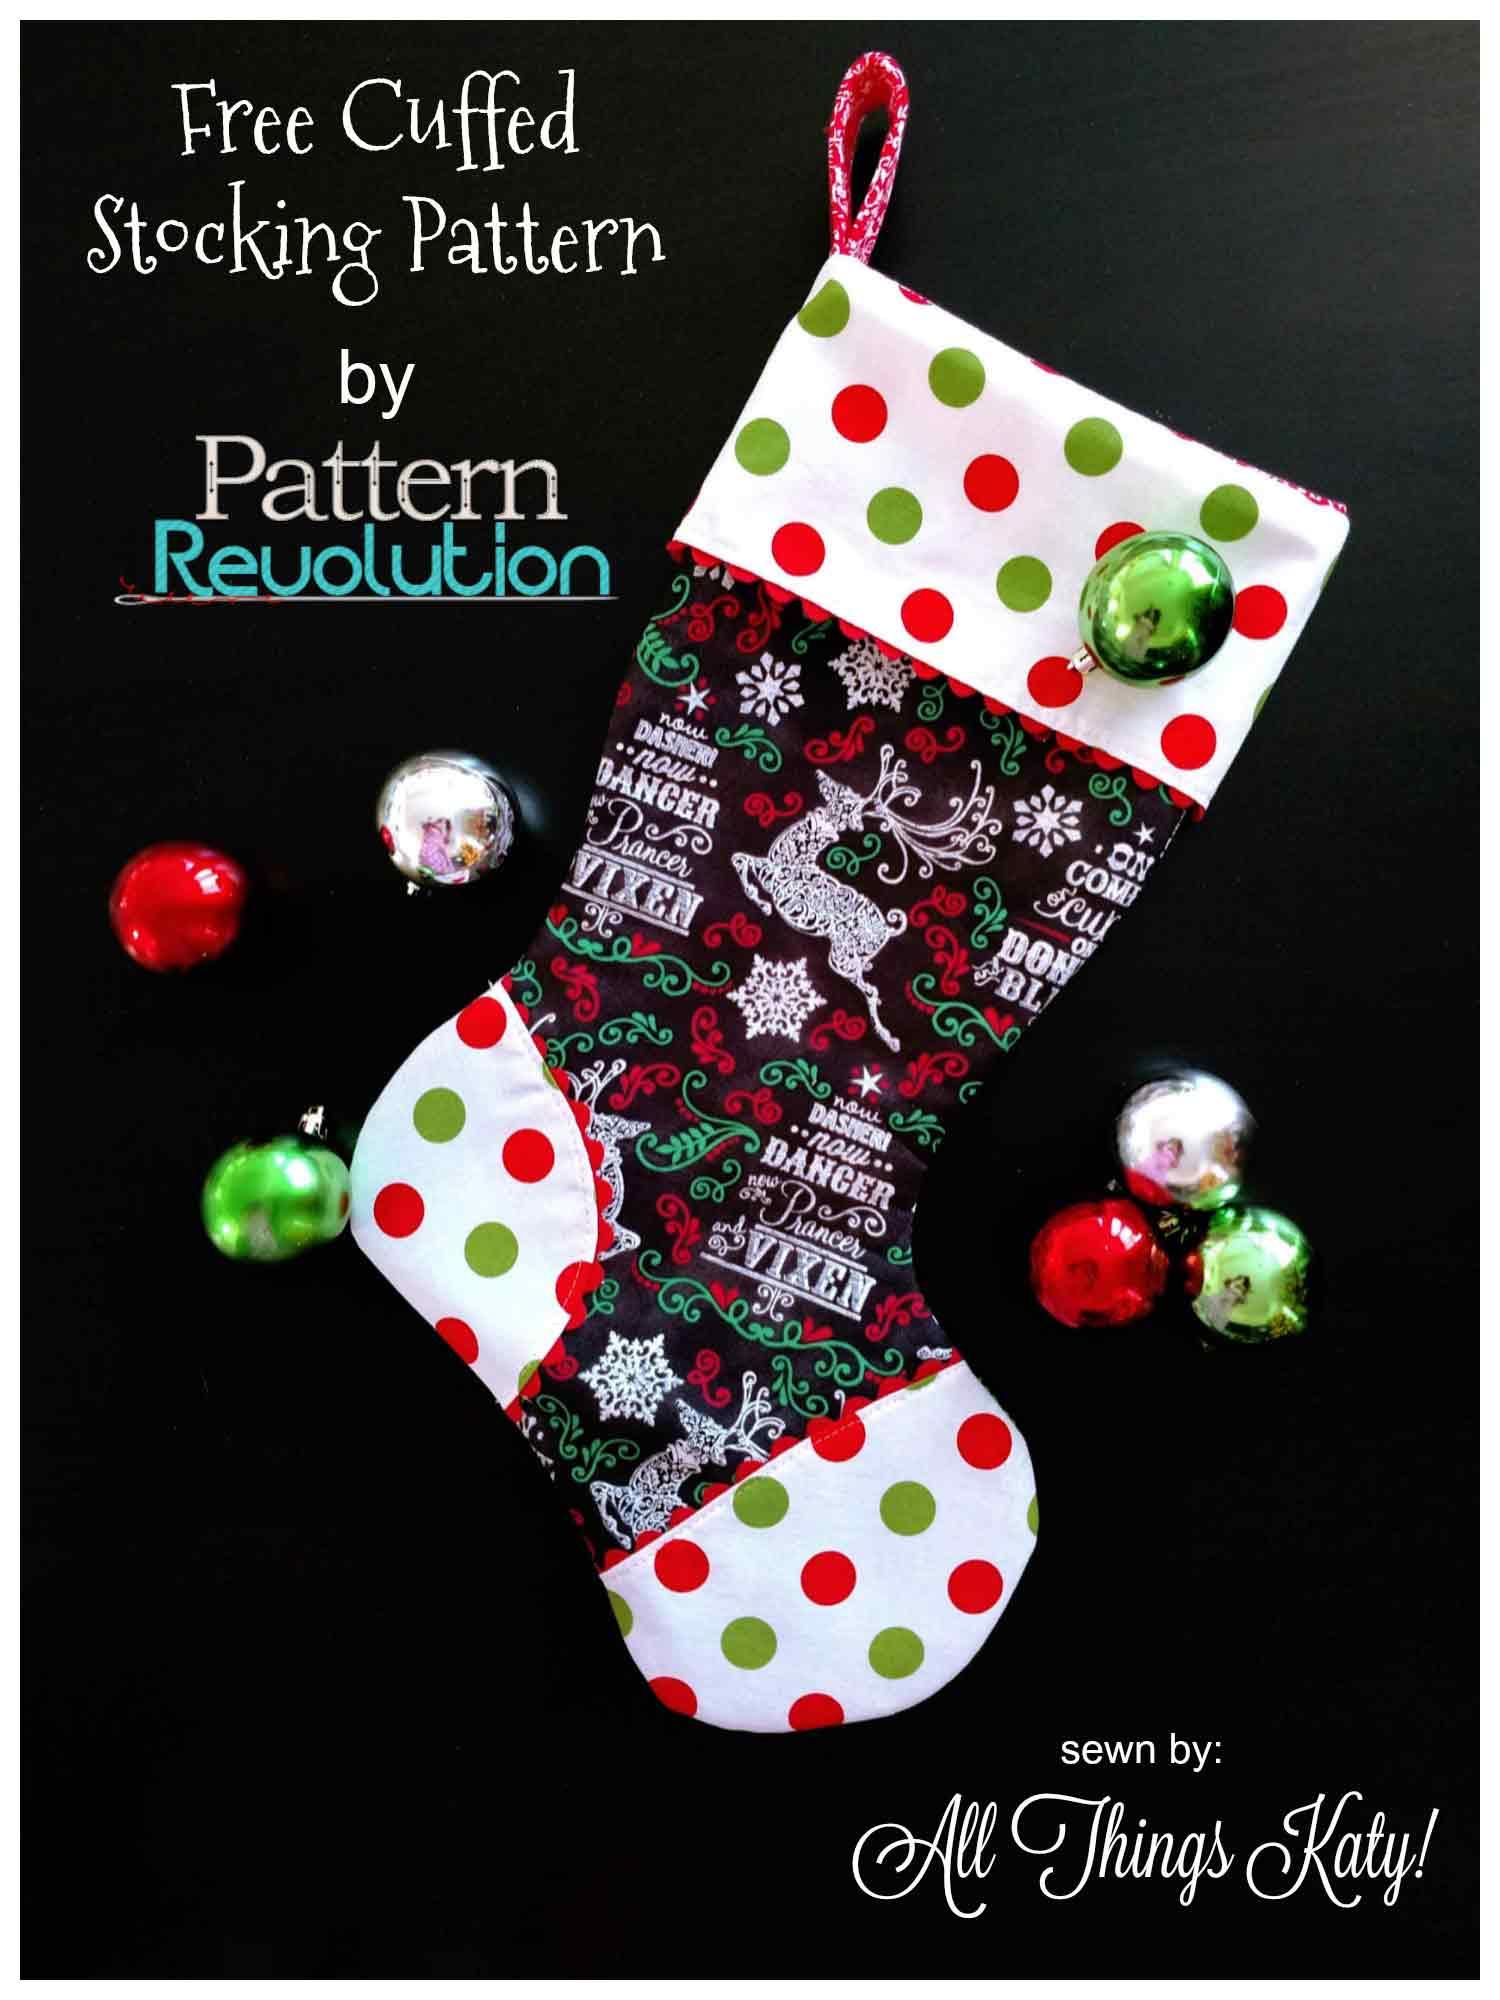 pr_stocking_flat_lay_wm.jpg